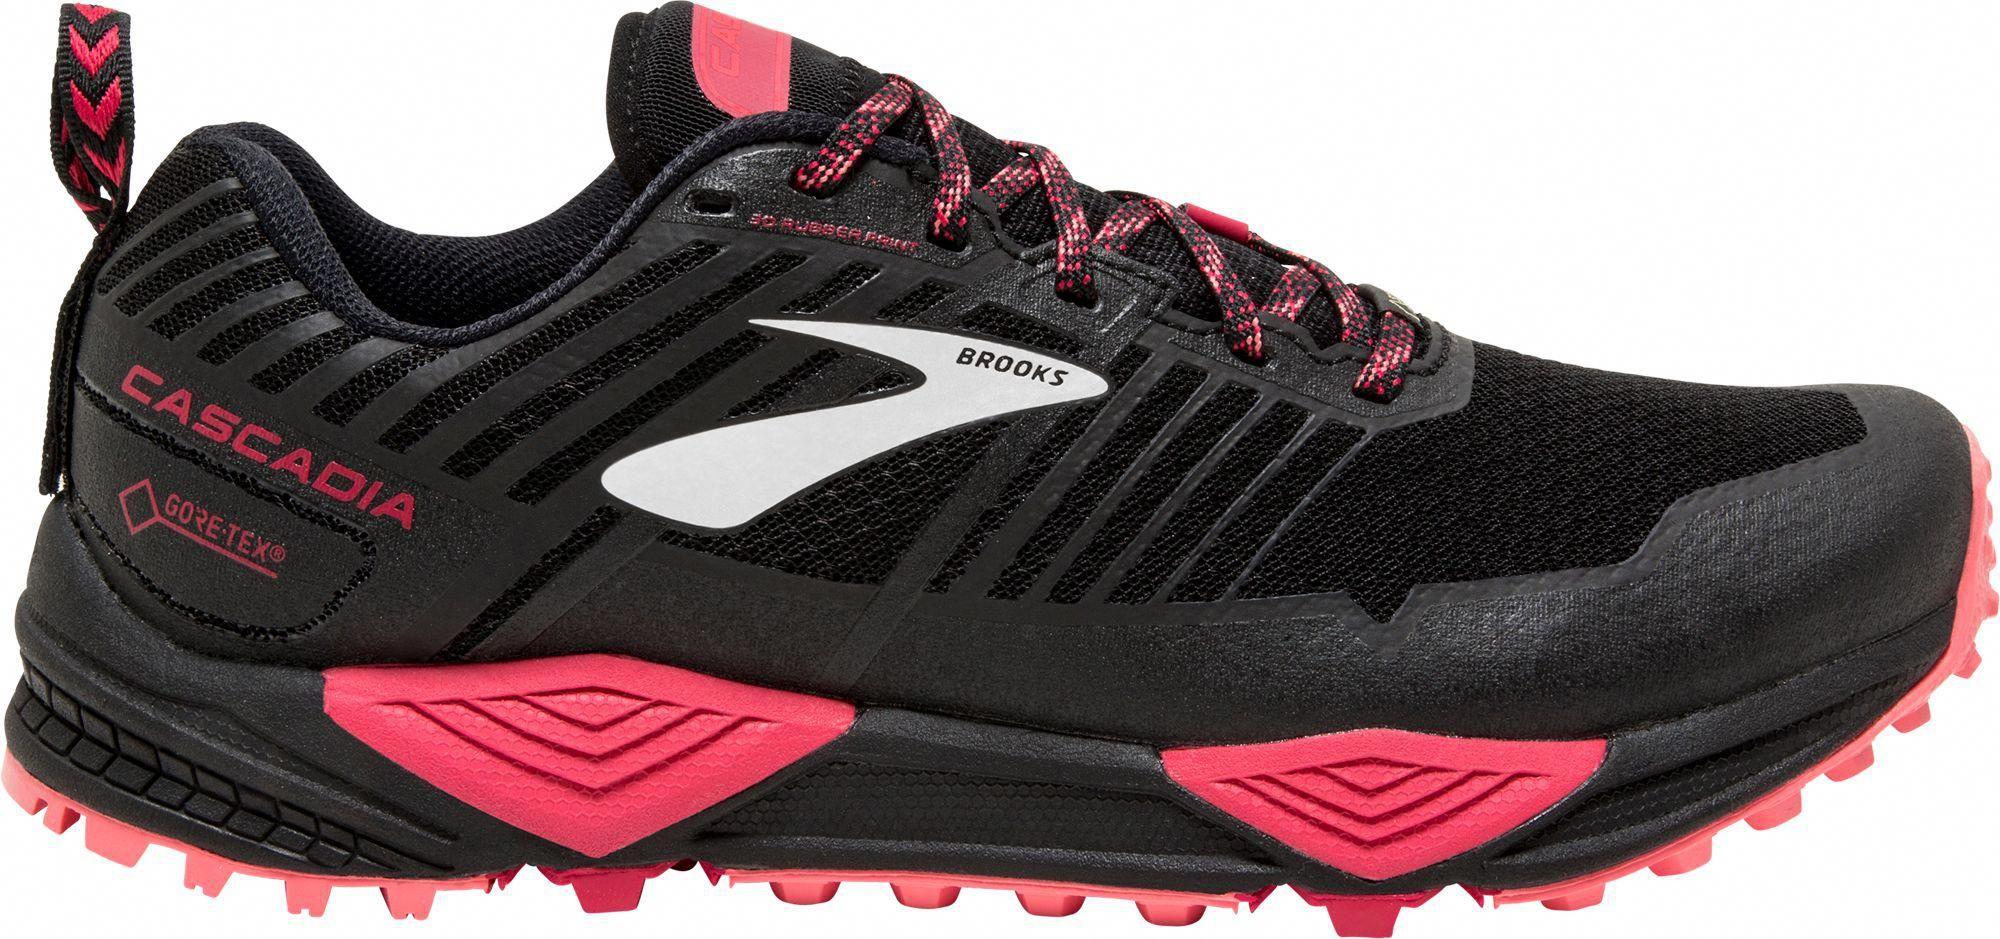 0508f6c1f85 Brooks Women s Cascadia 13 GTX Trail Running Shoes